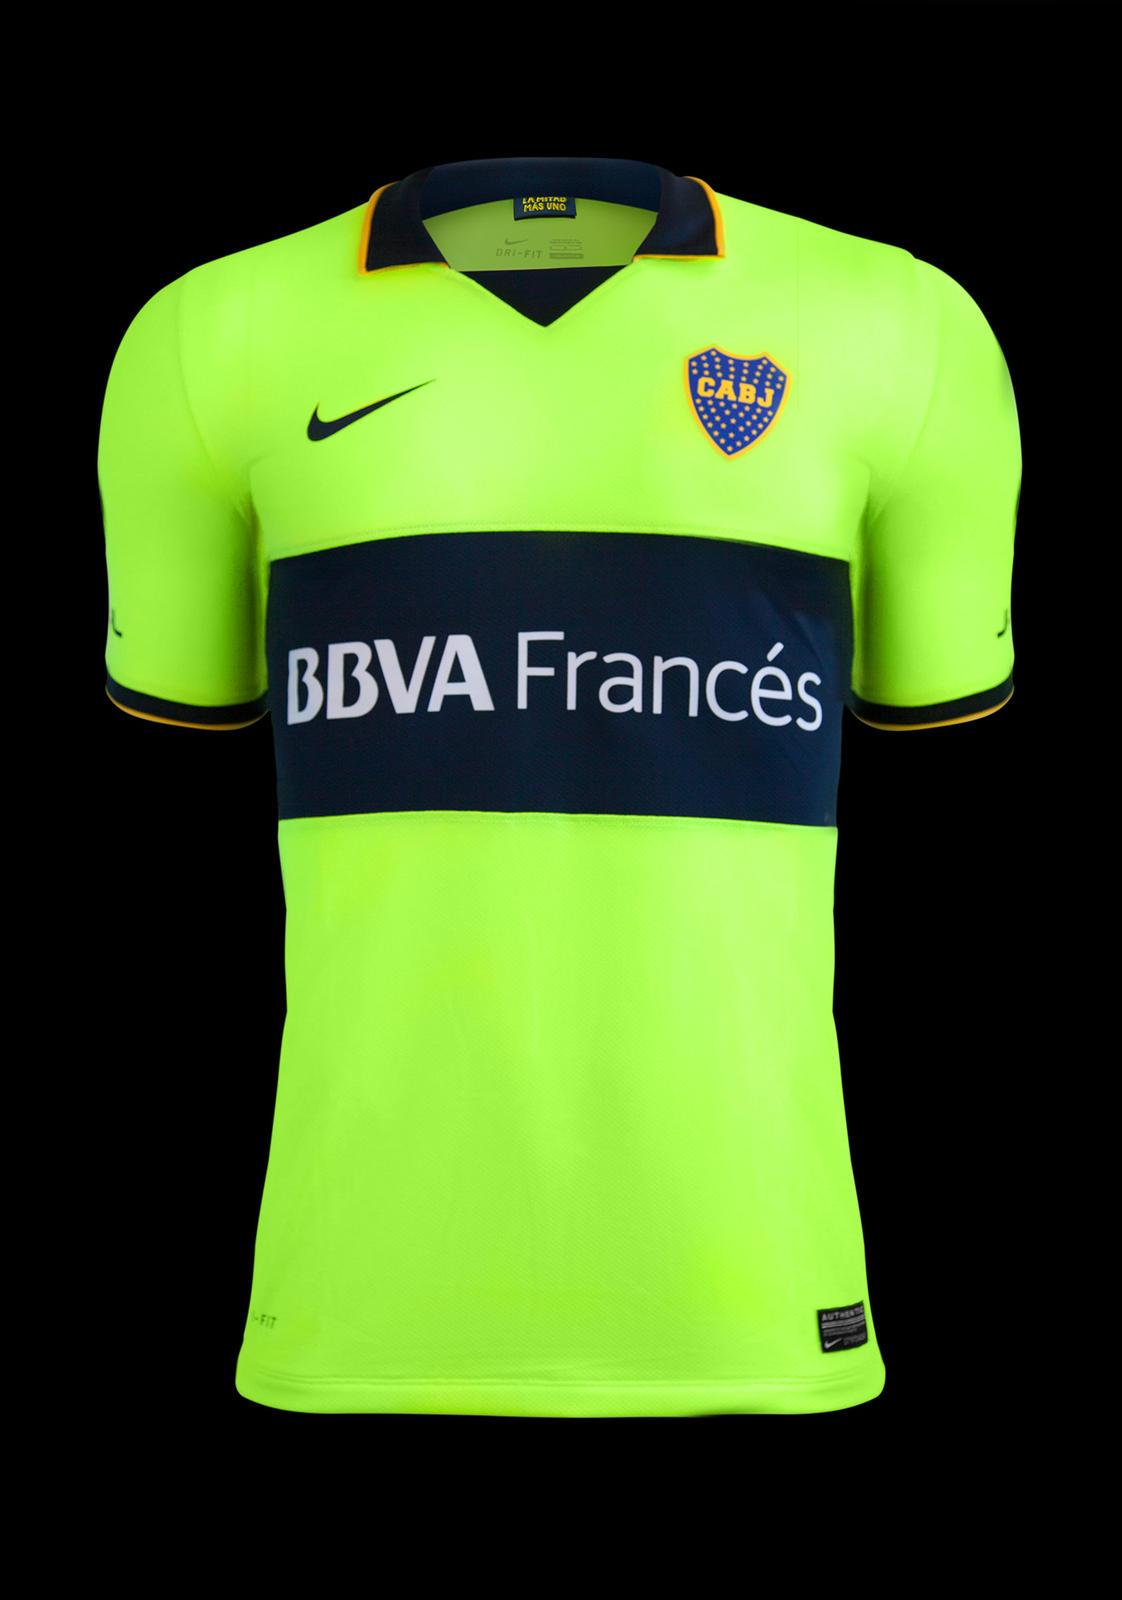 Boca Juniors T Shirt Design